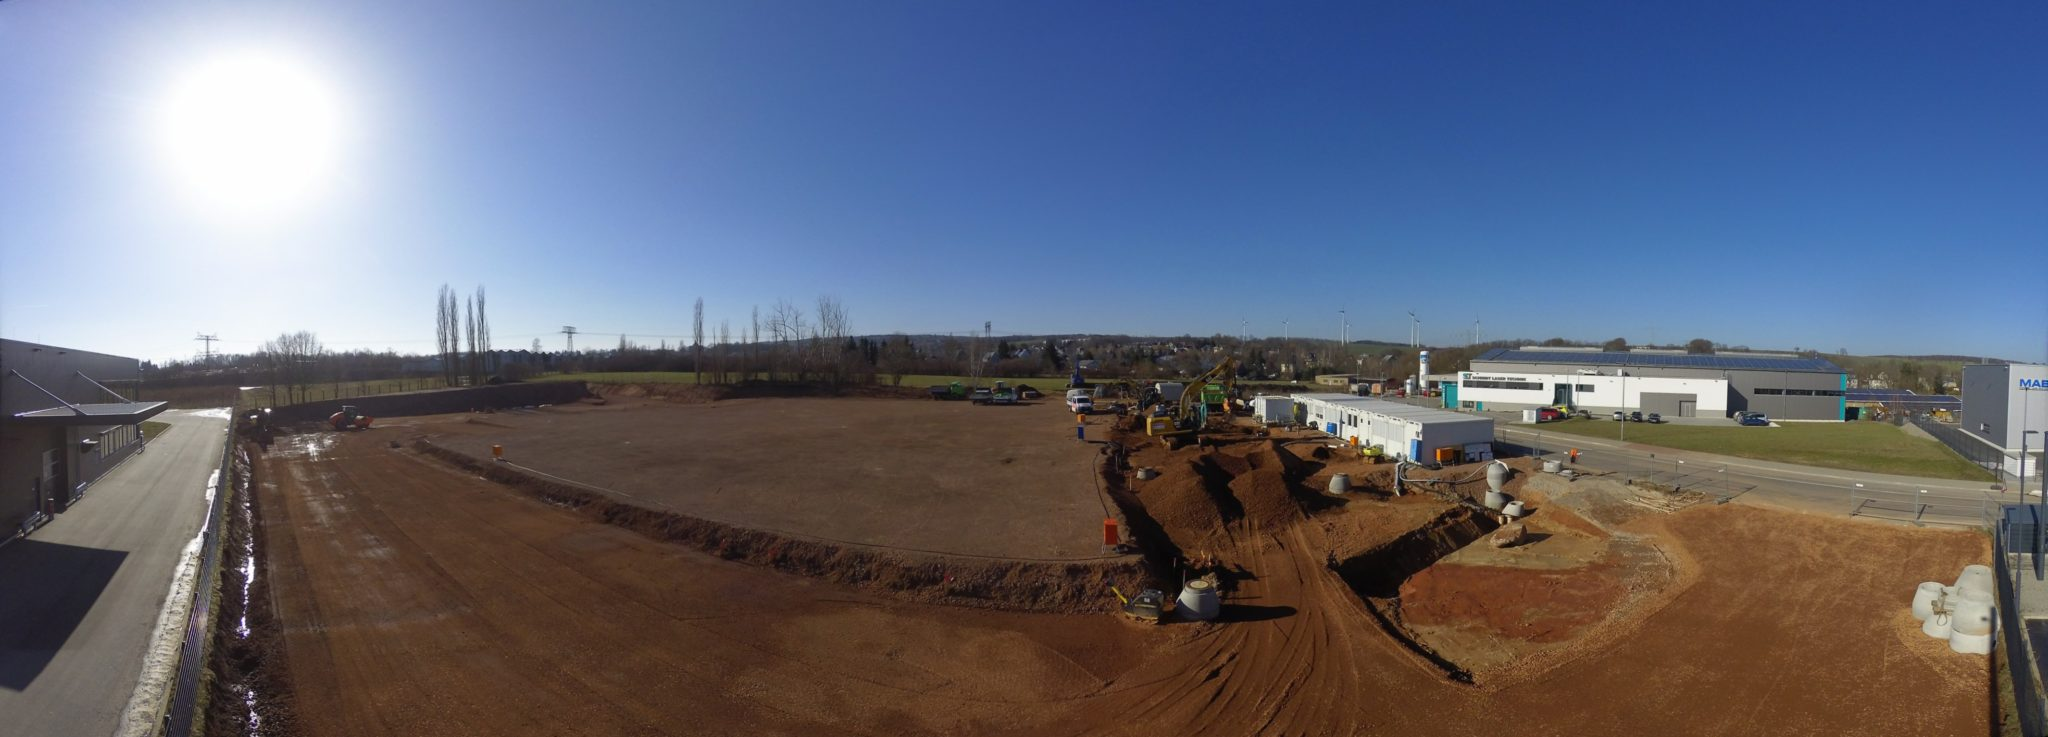 Baufortschritt Ende Februar